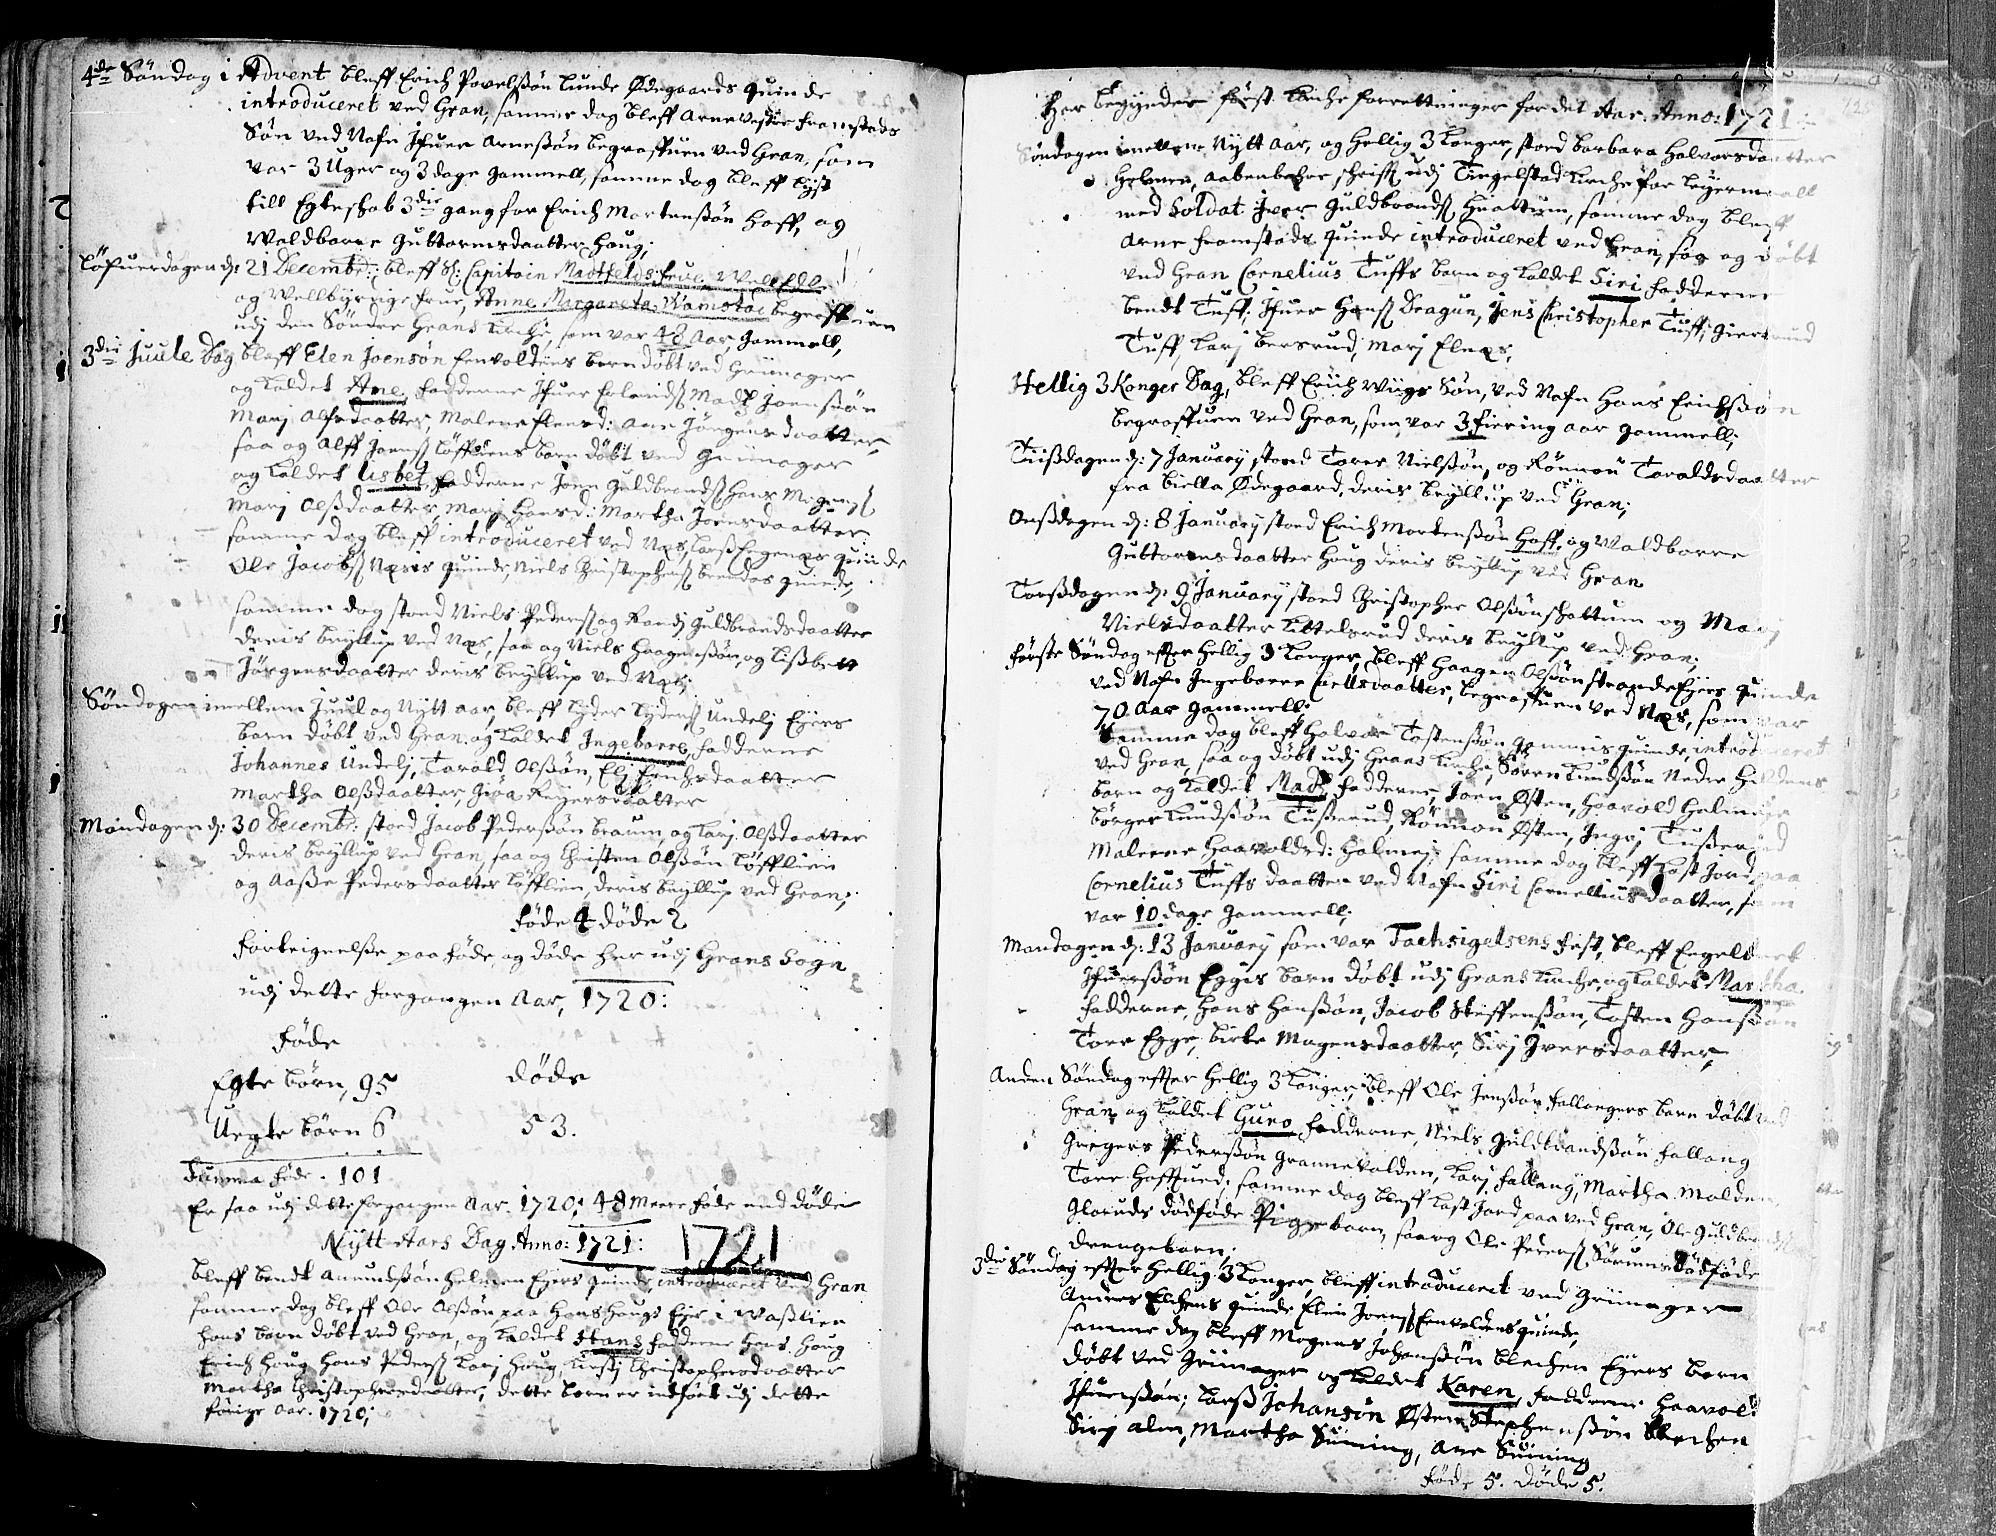 SAH, Gran prestekontor, Ministerialbok nr. 1, 1707-1731, s. 125